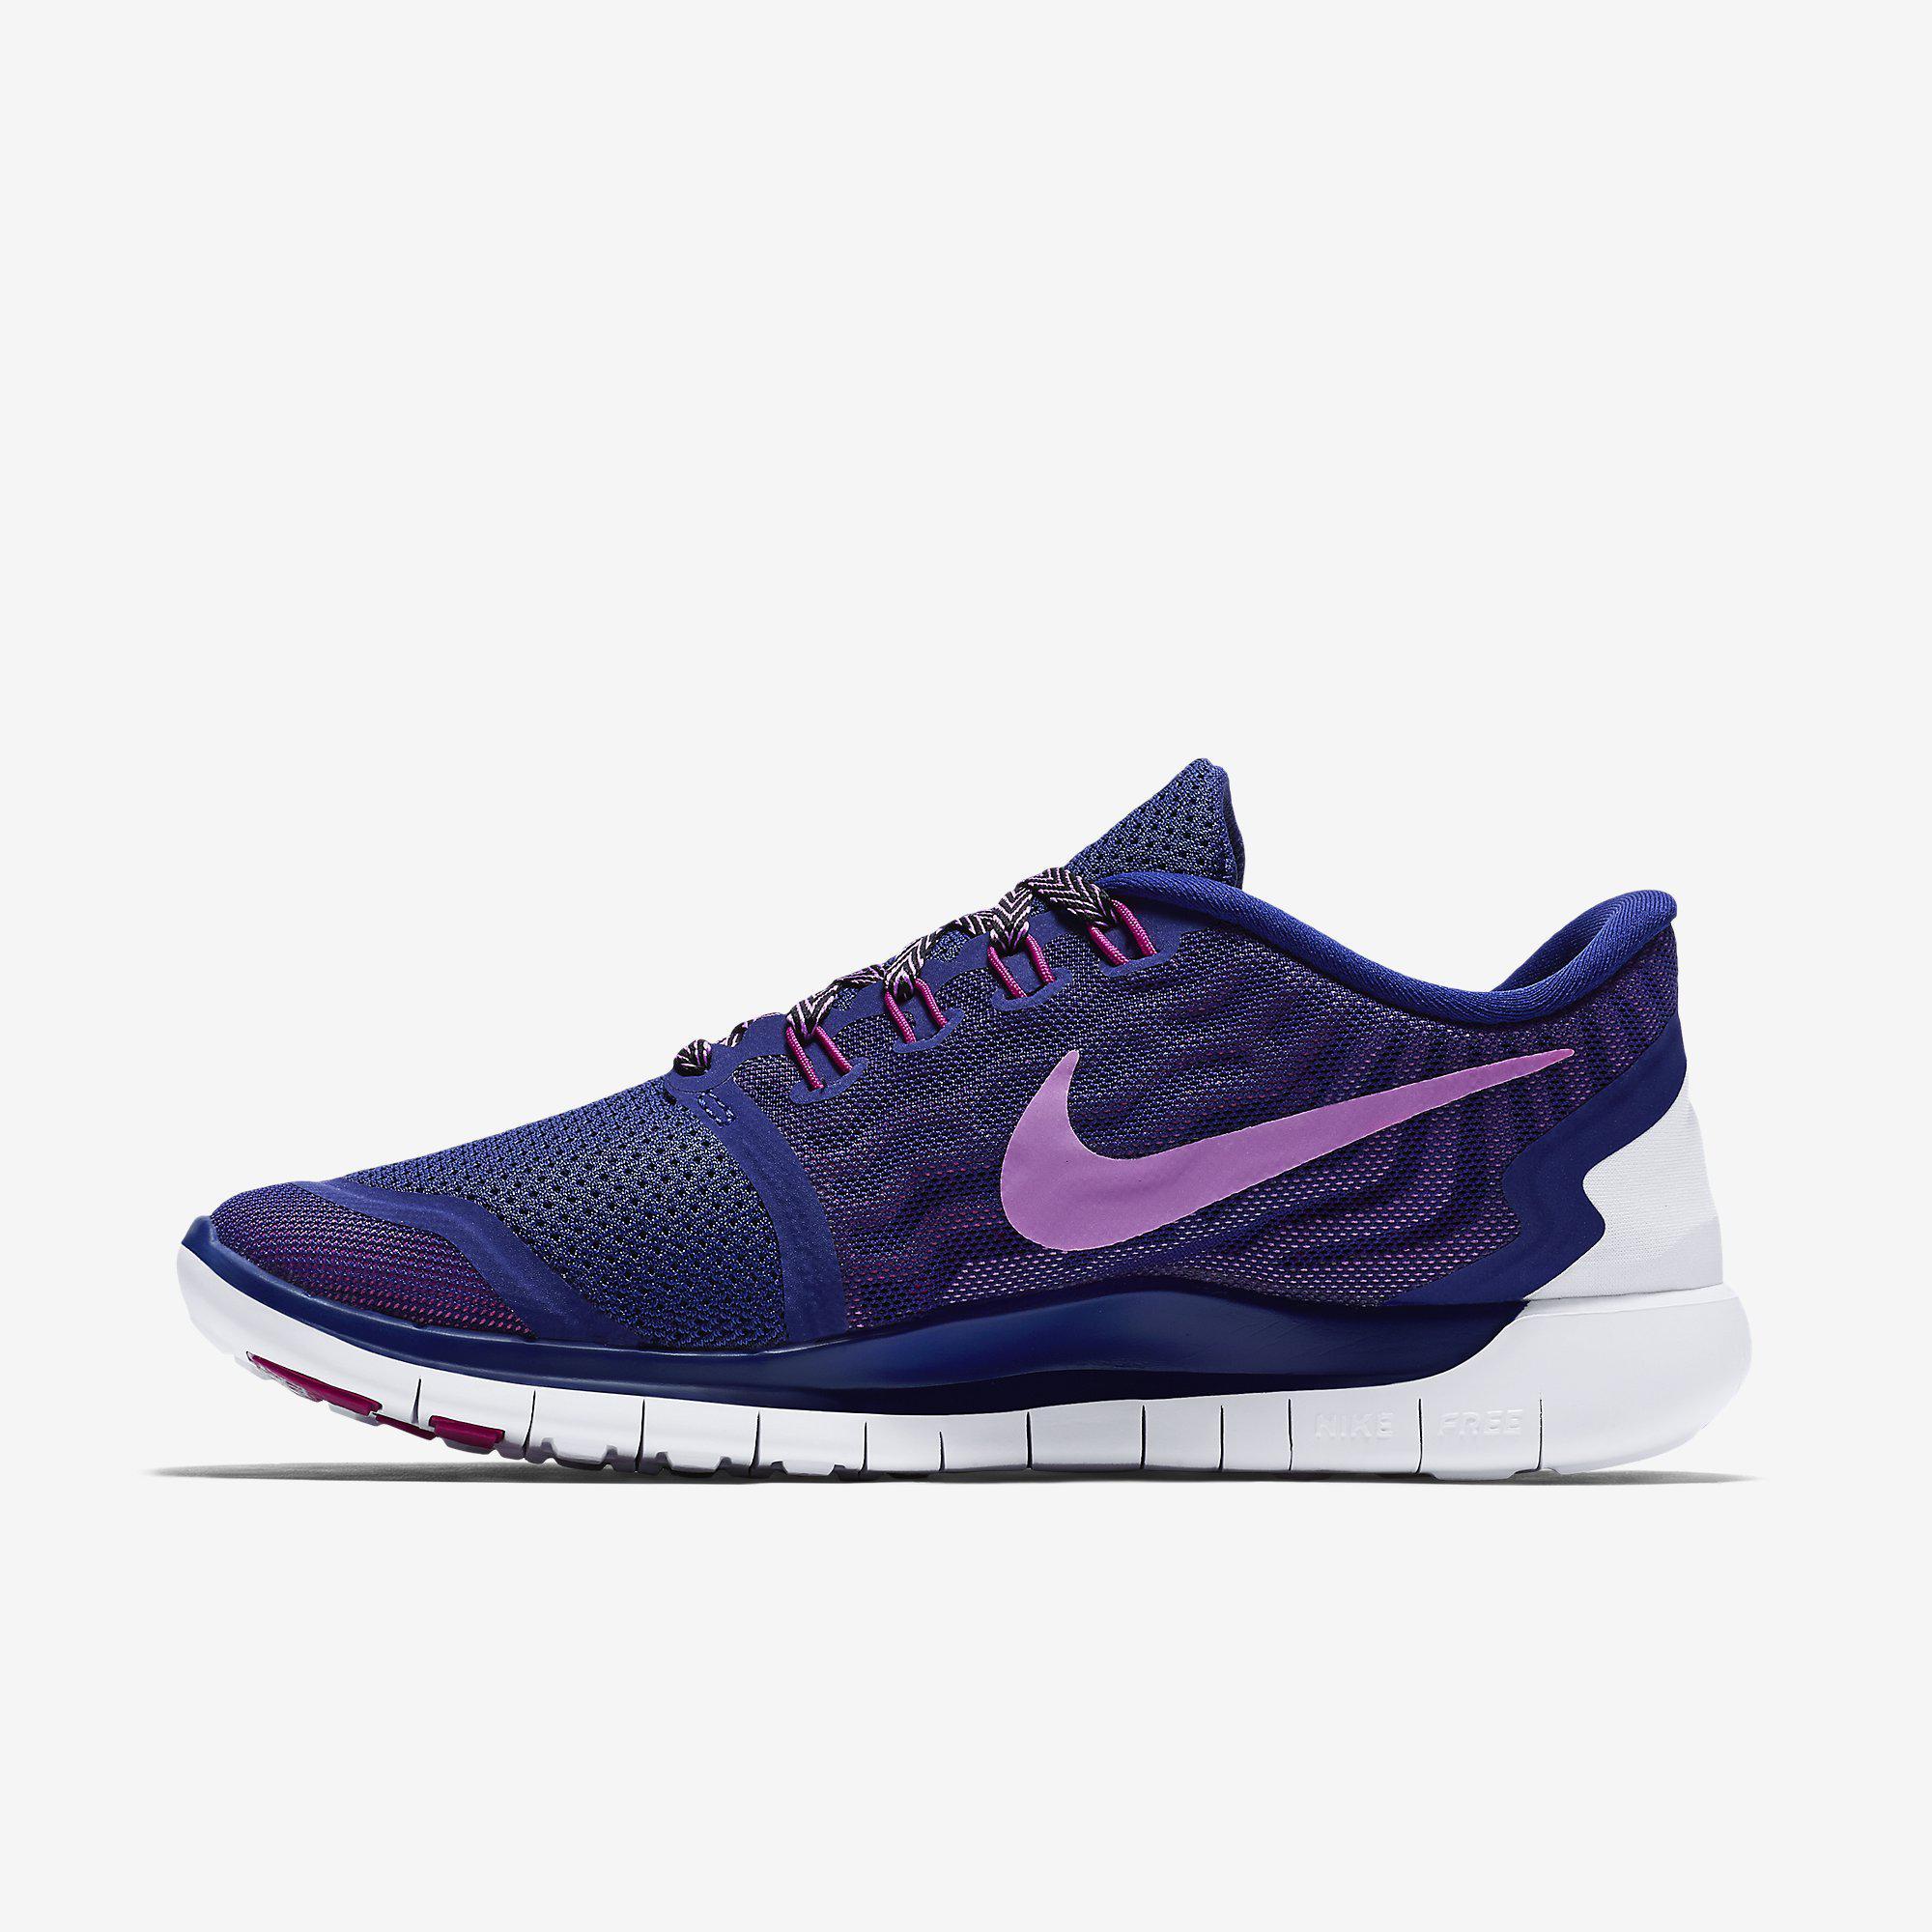 Nike Damenns Free 5.0+ Running schuhe Deep Royal BlueFuchsia Flash